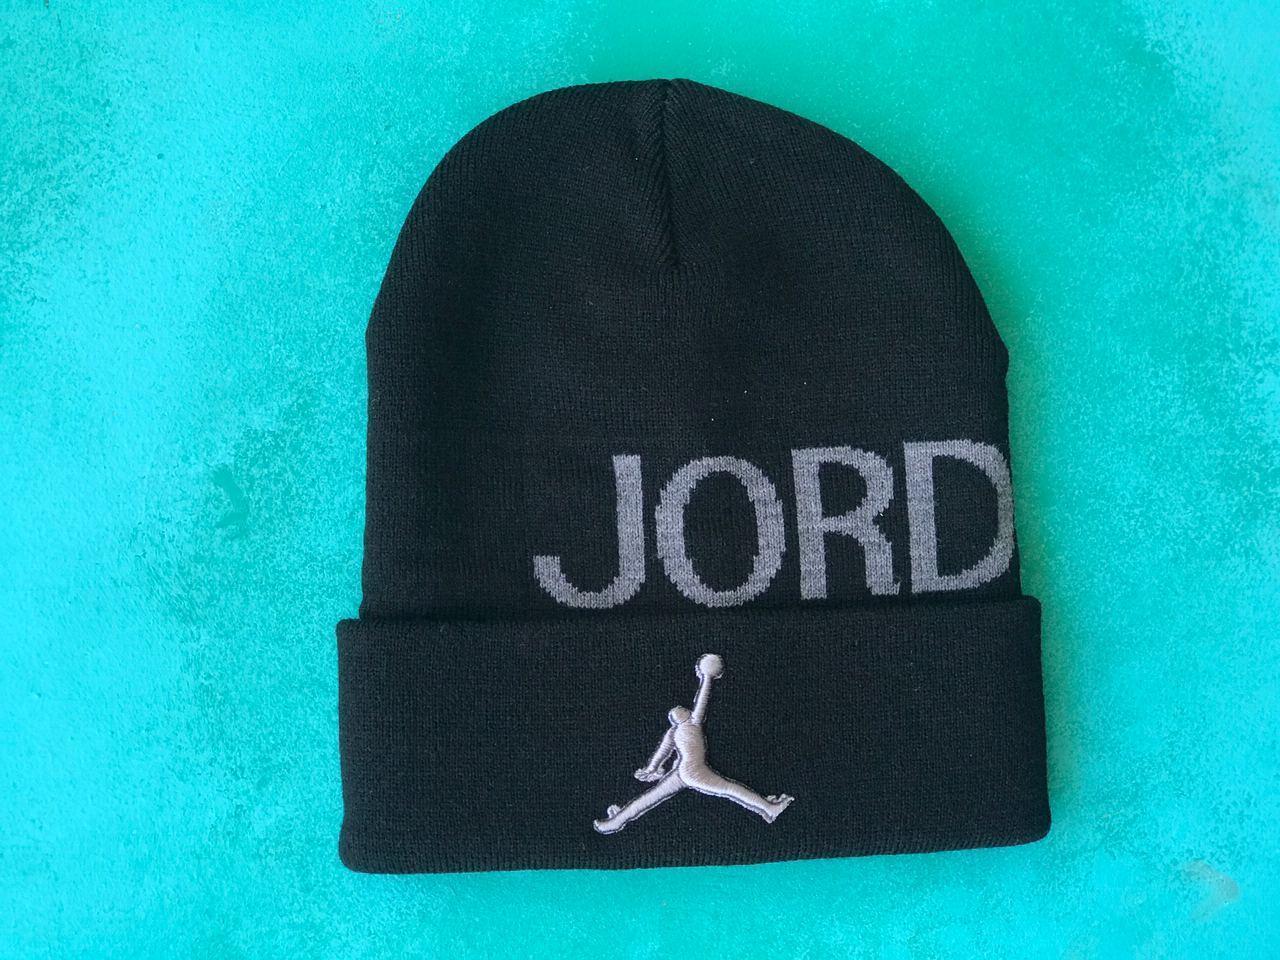 Шапка JORDAN  / шапка джордан / шапка женская/шапка мужская/черный